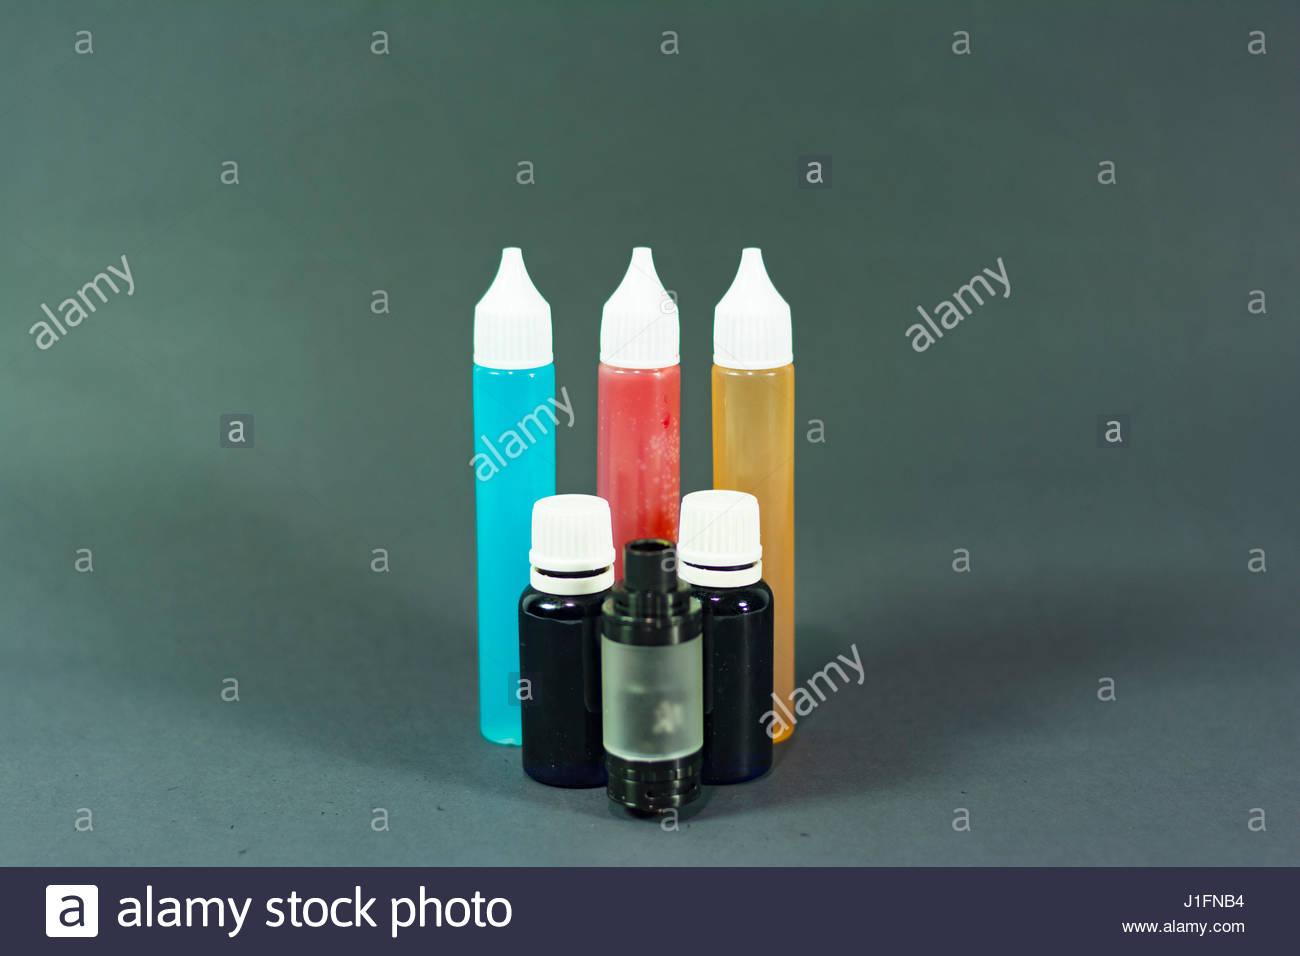 e cigarette liquid bottles on isolated black background photograph - Stock Image